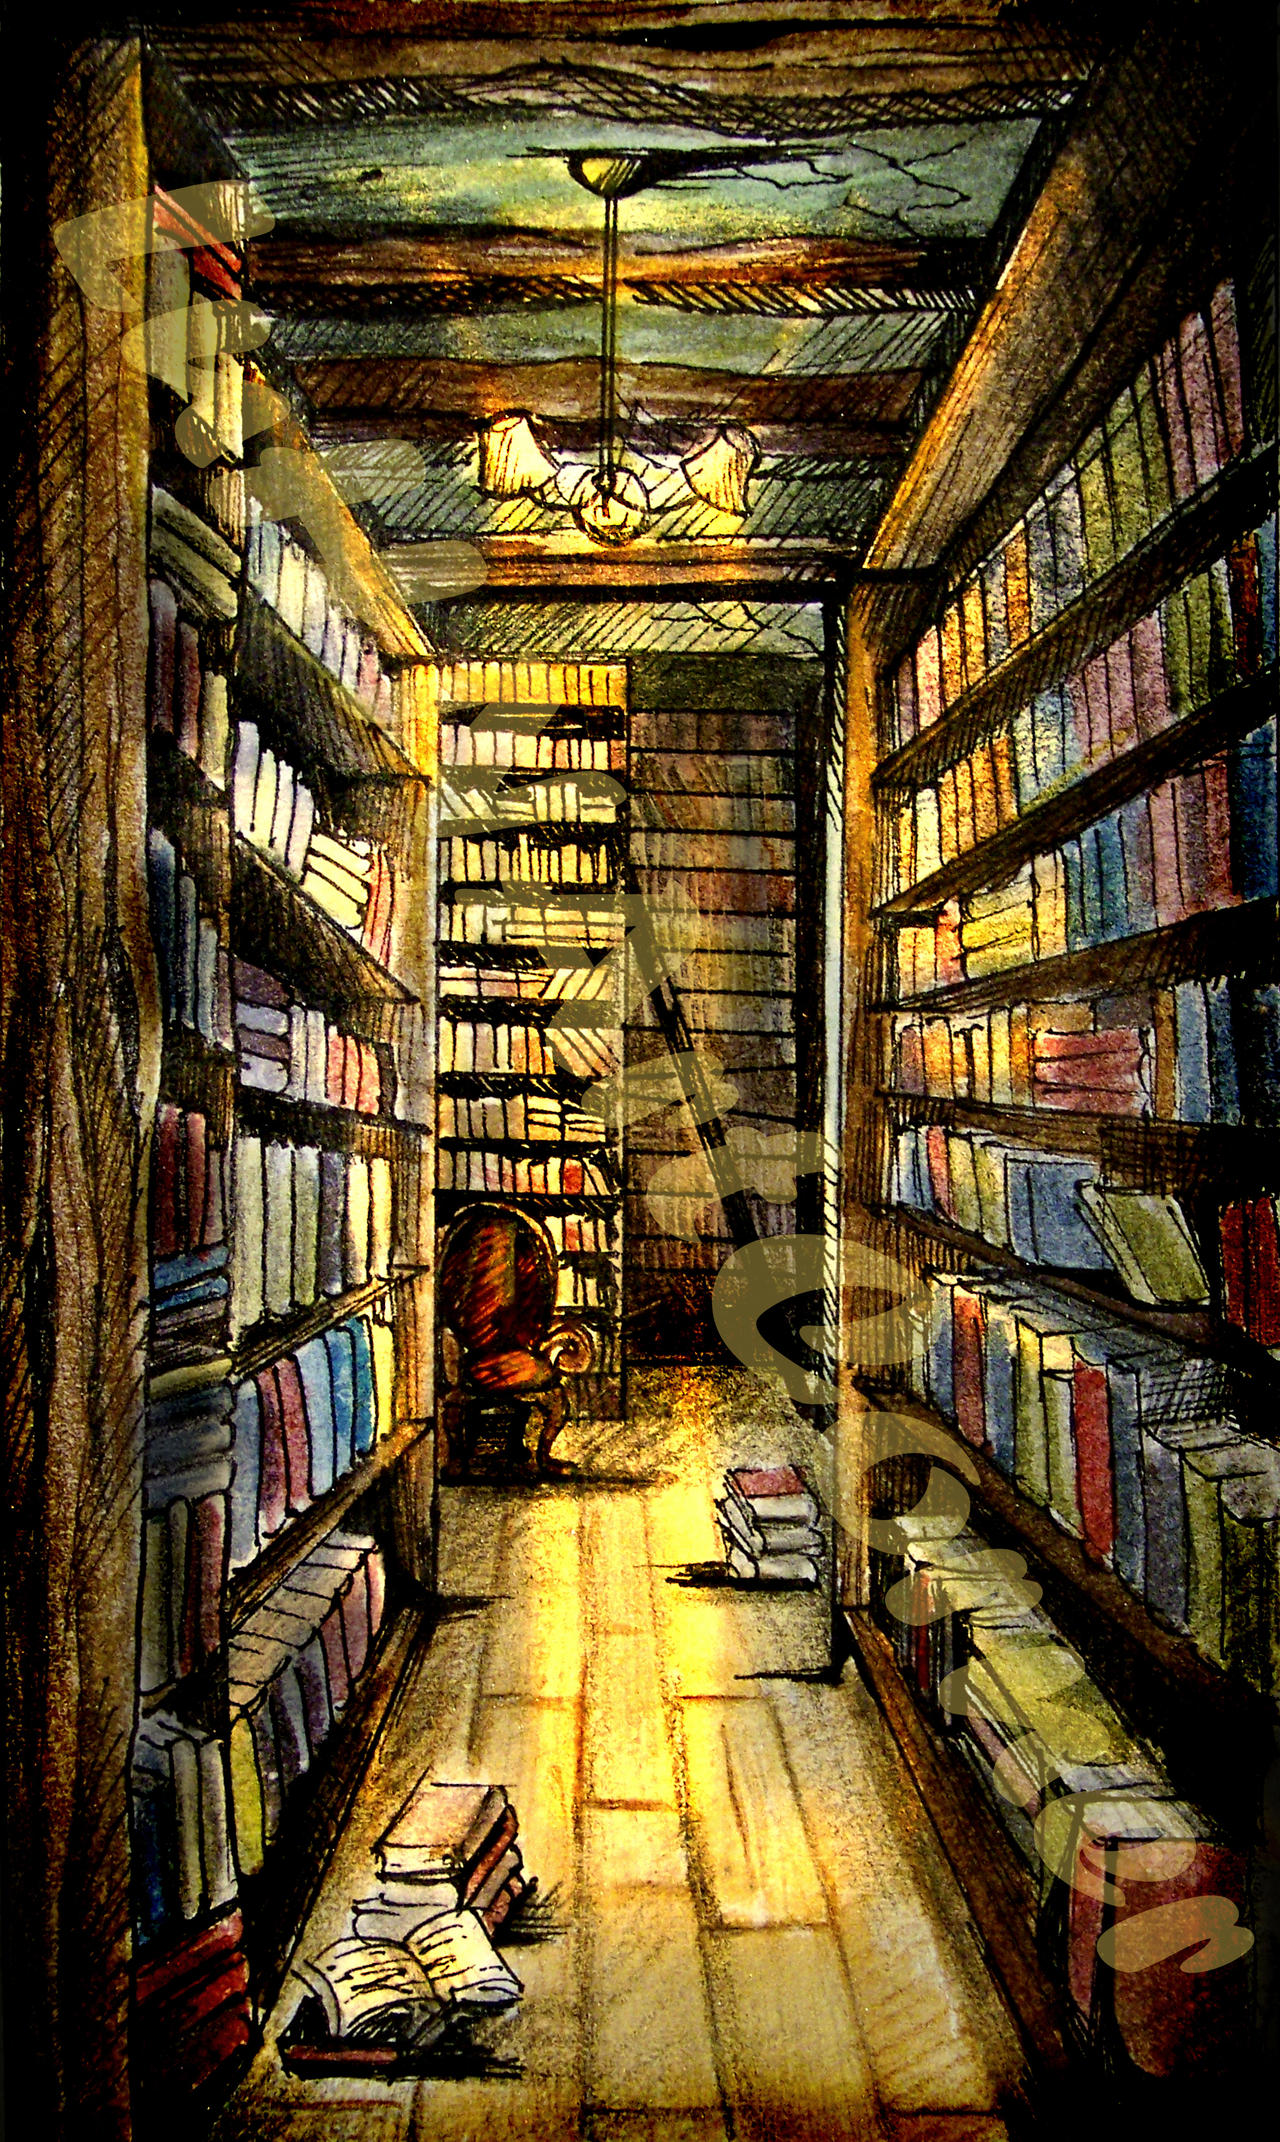 Library Illustration by LourdesHN on DeviantArt